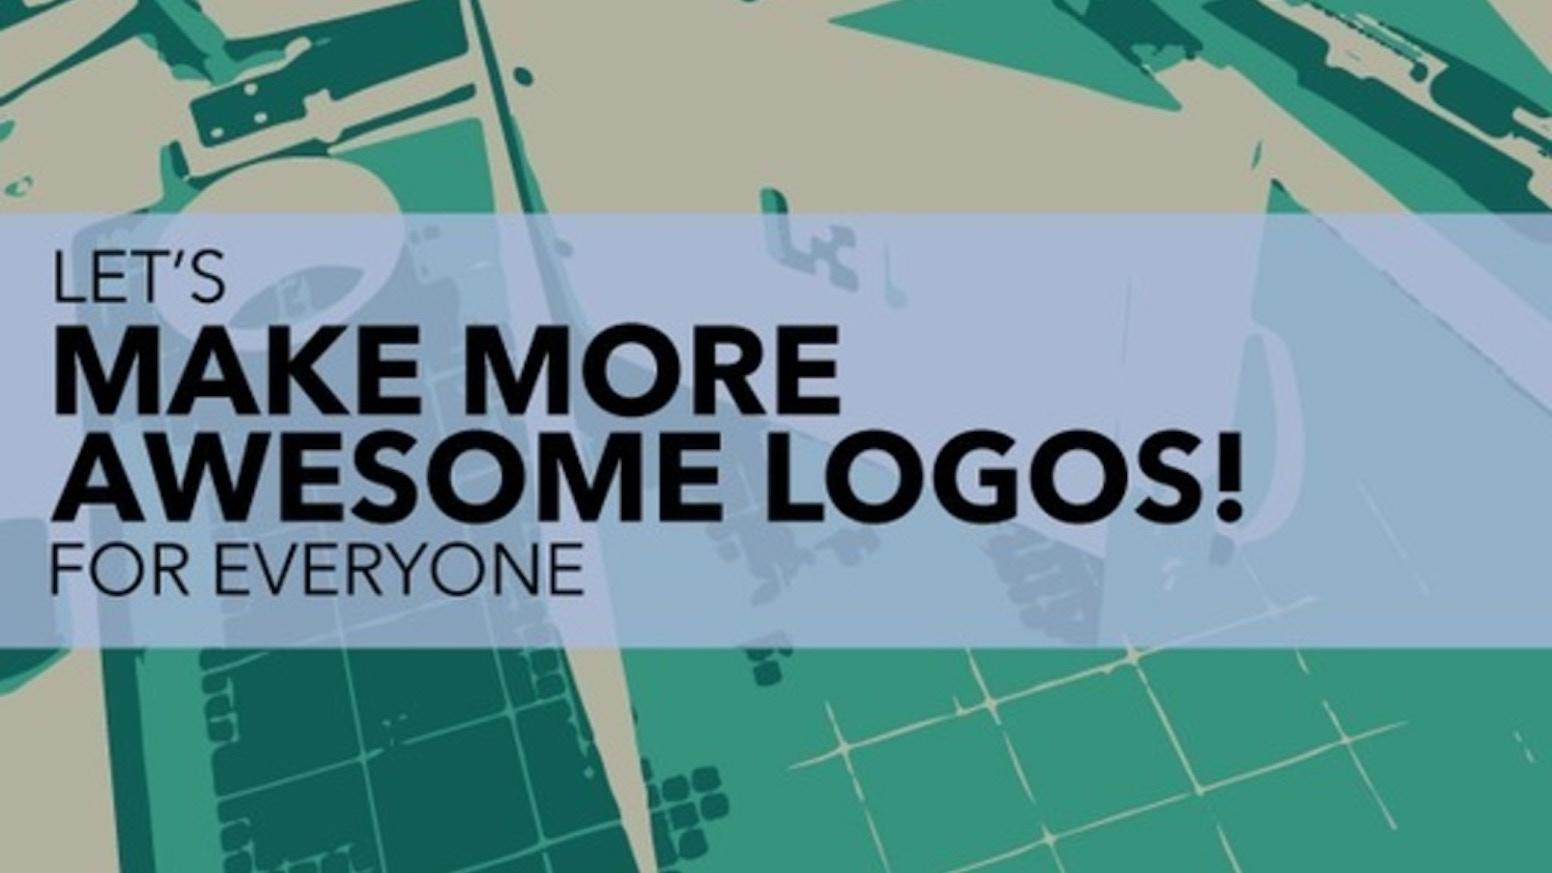 7b4e87d7 Let's Make More Awesome Logos! by Bilal Rayes (supprimé) — Kickstarter